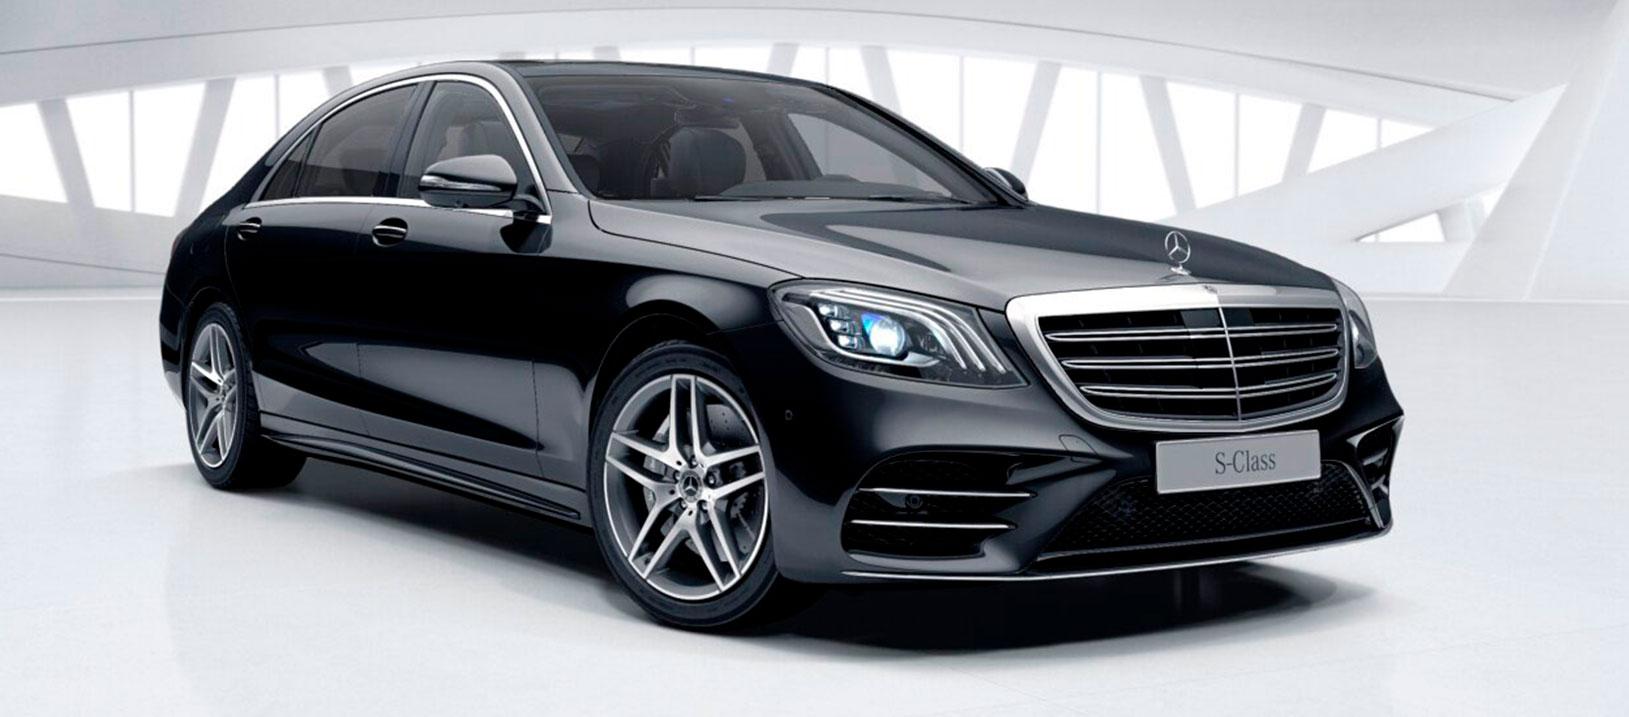 Mercedes-Benz S 400 d 4MATIC long 52600213